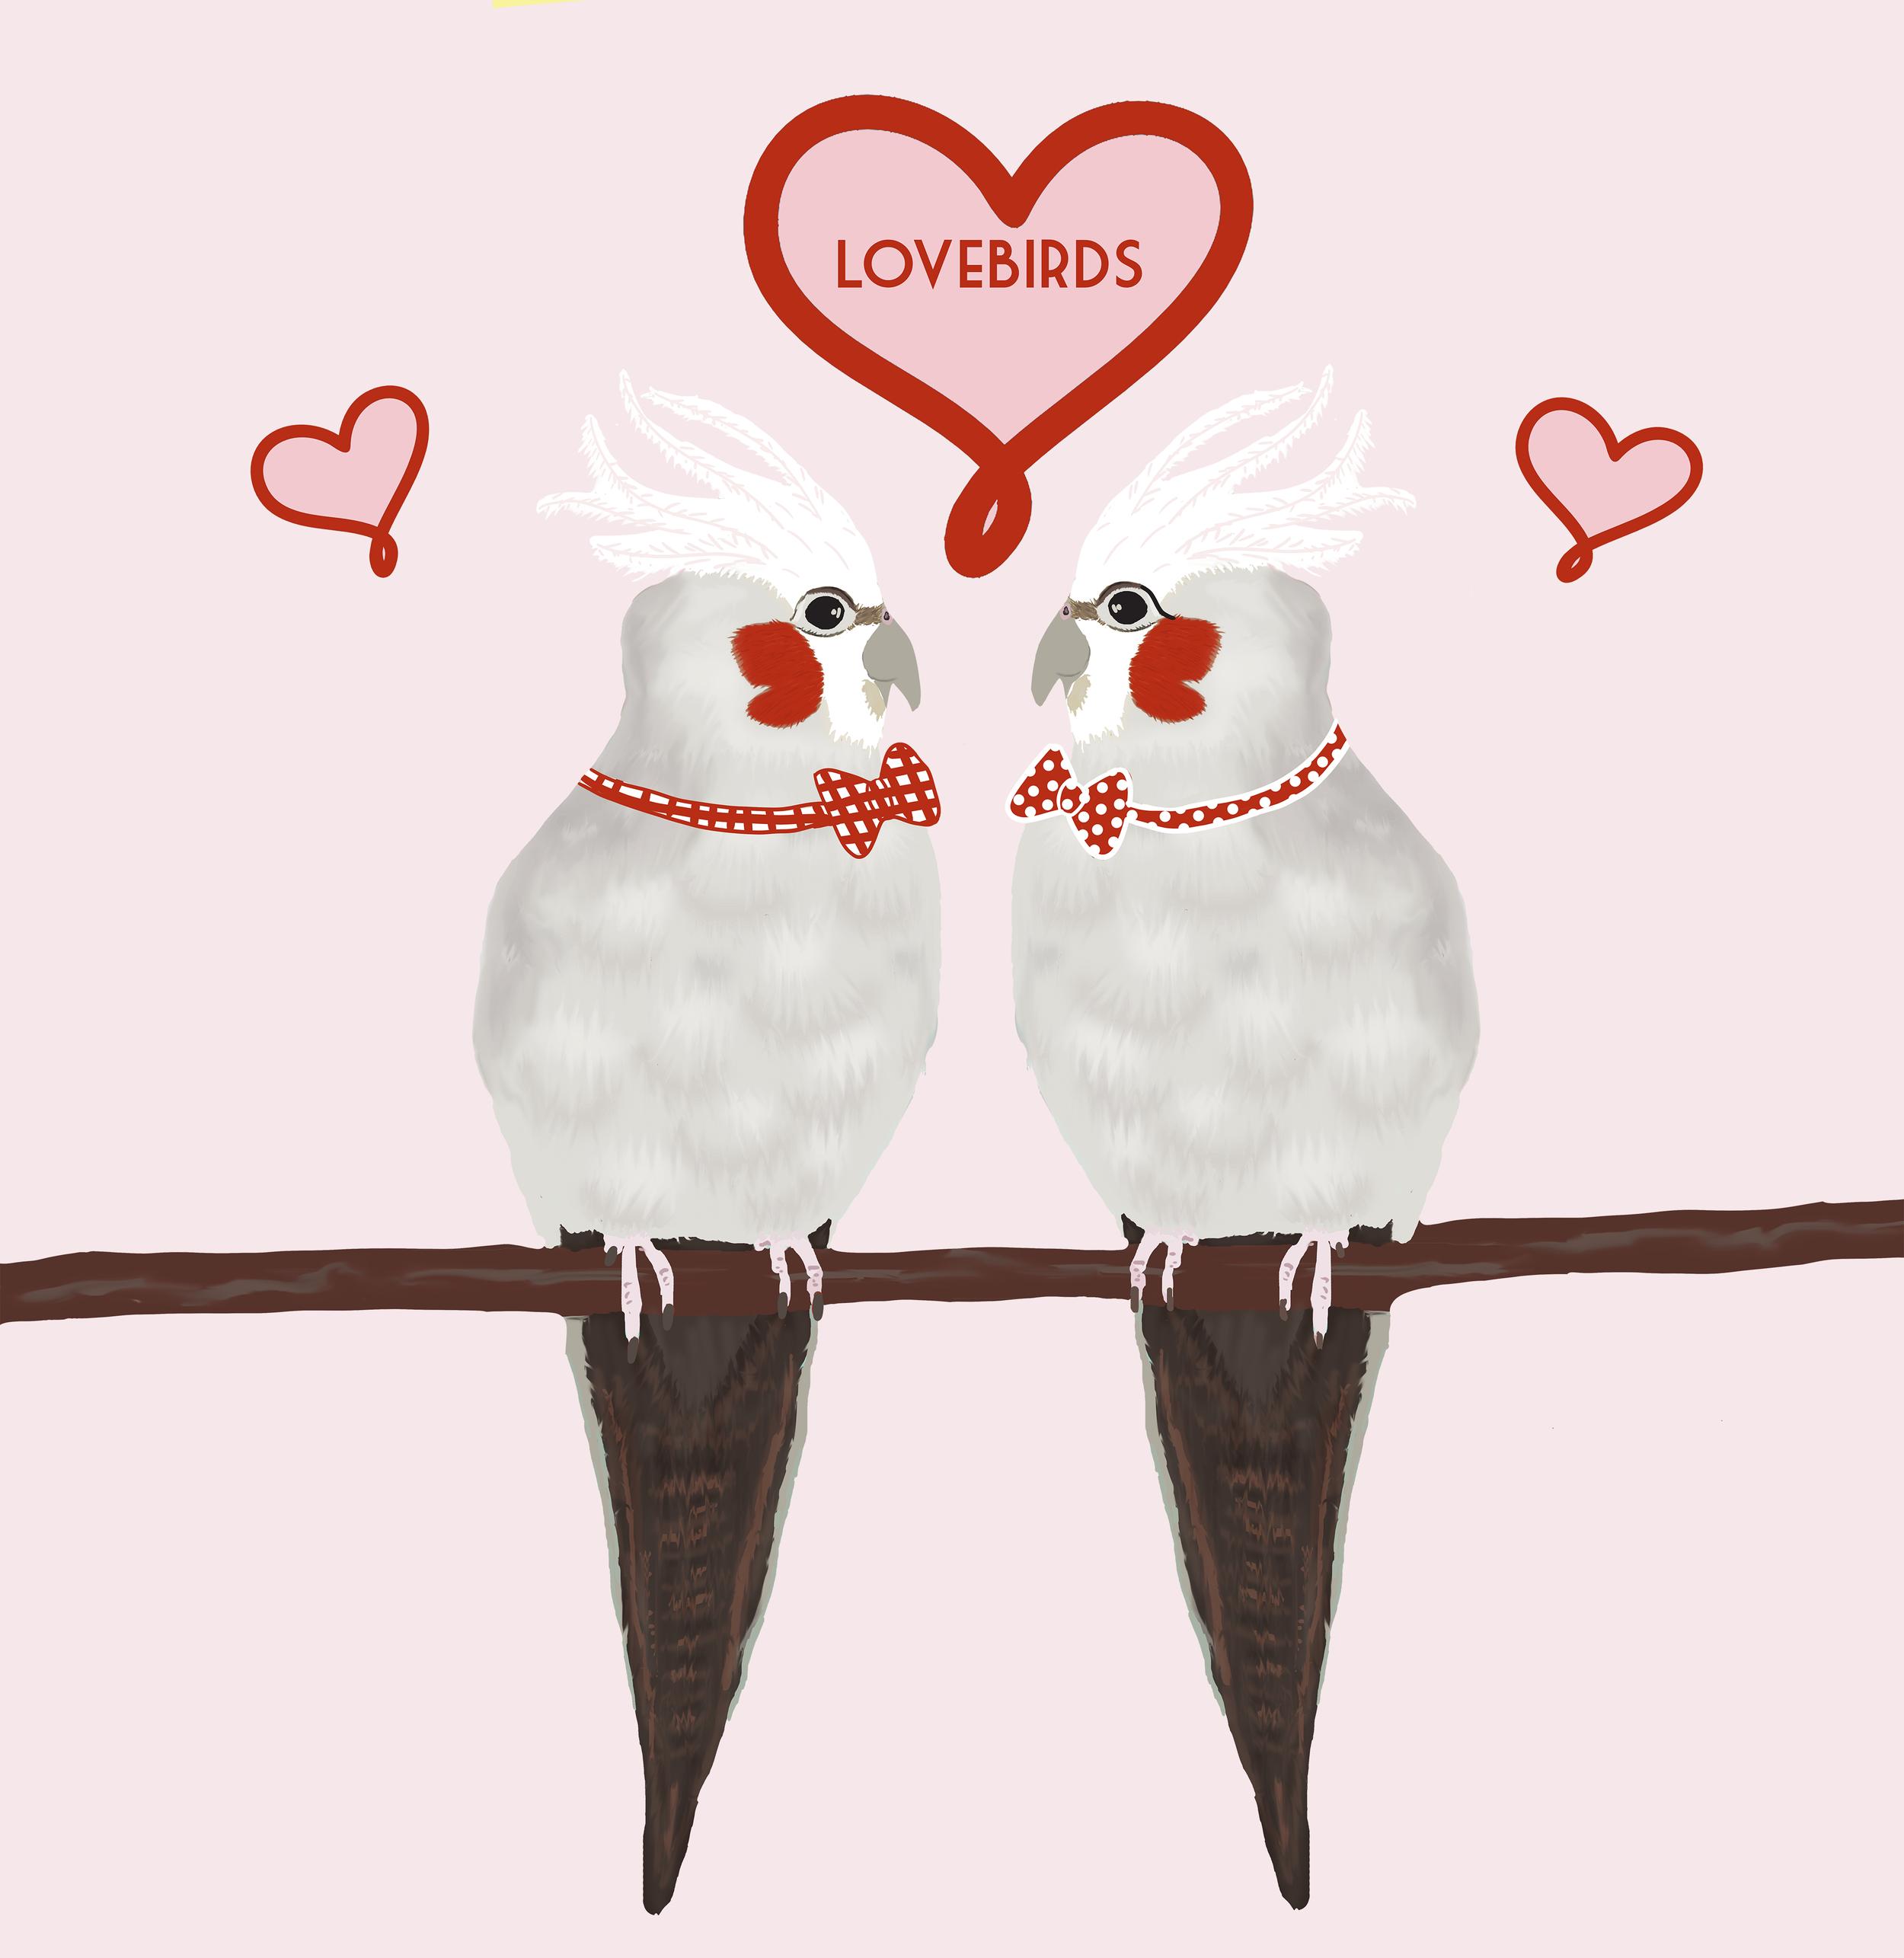 Lovebirdscouplemensmall.png